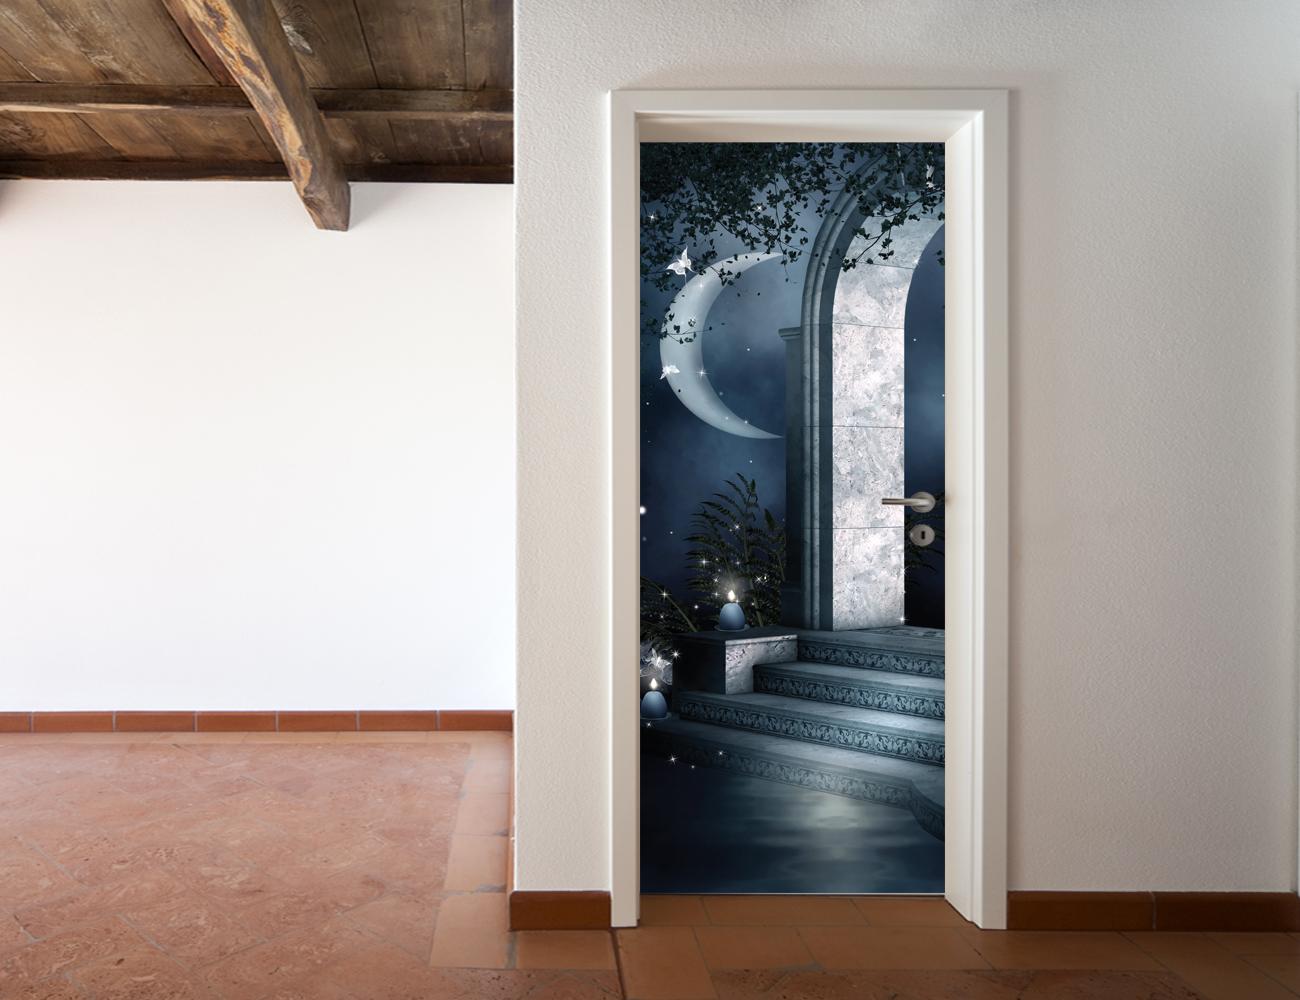 Adesivi follia adesivo per porte luna - Adesivi decorativi per porte ...